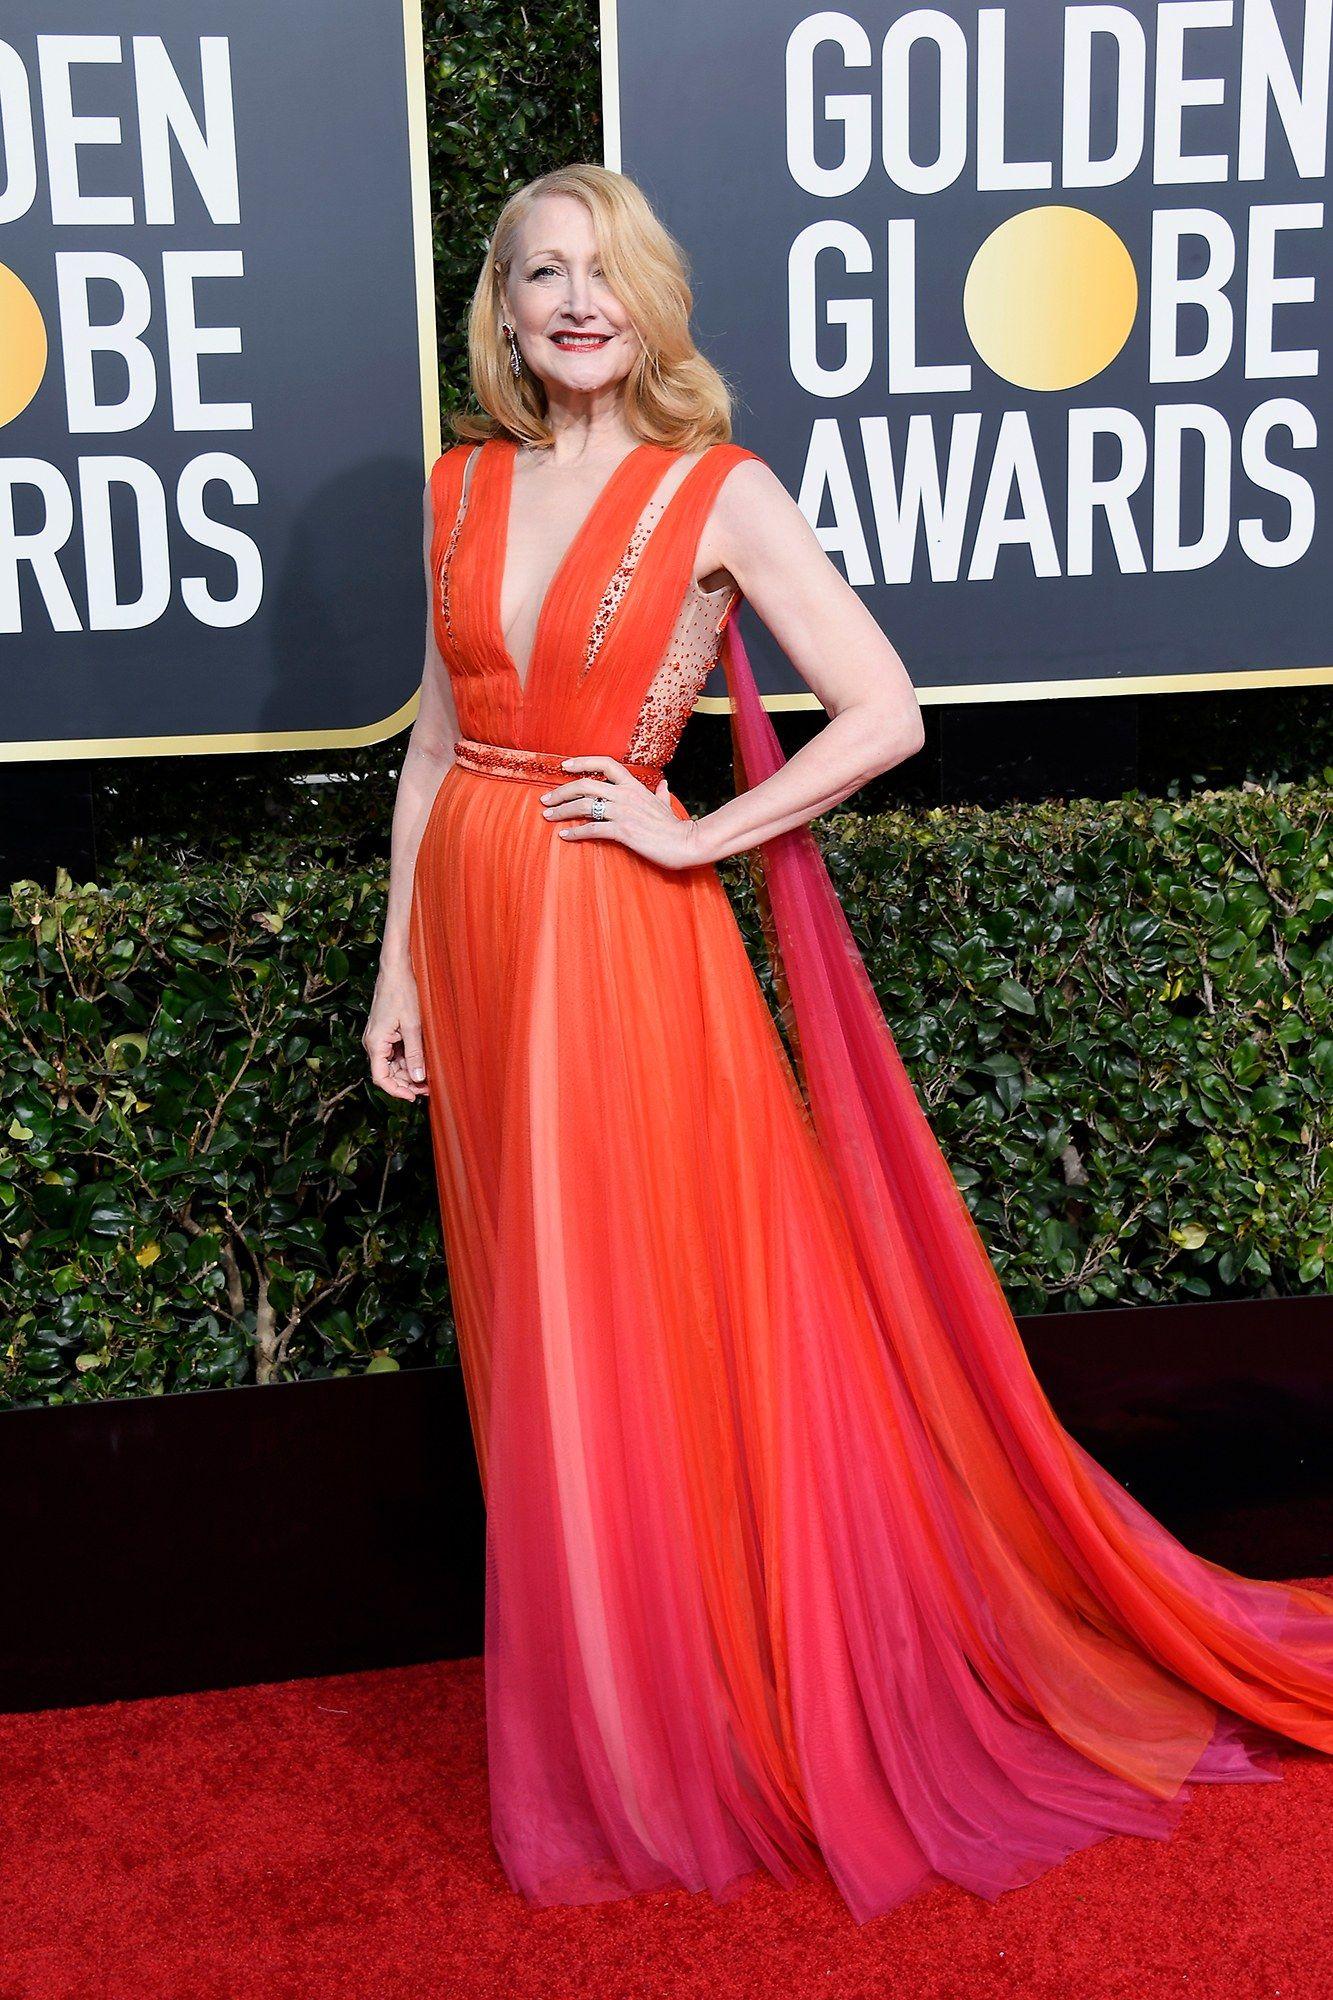 Best & worst dressed celebs at the 2019 Golden Globes